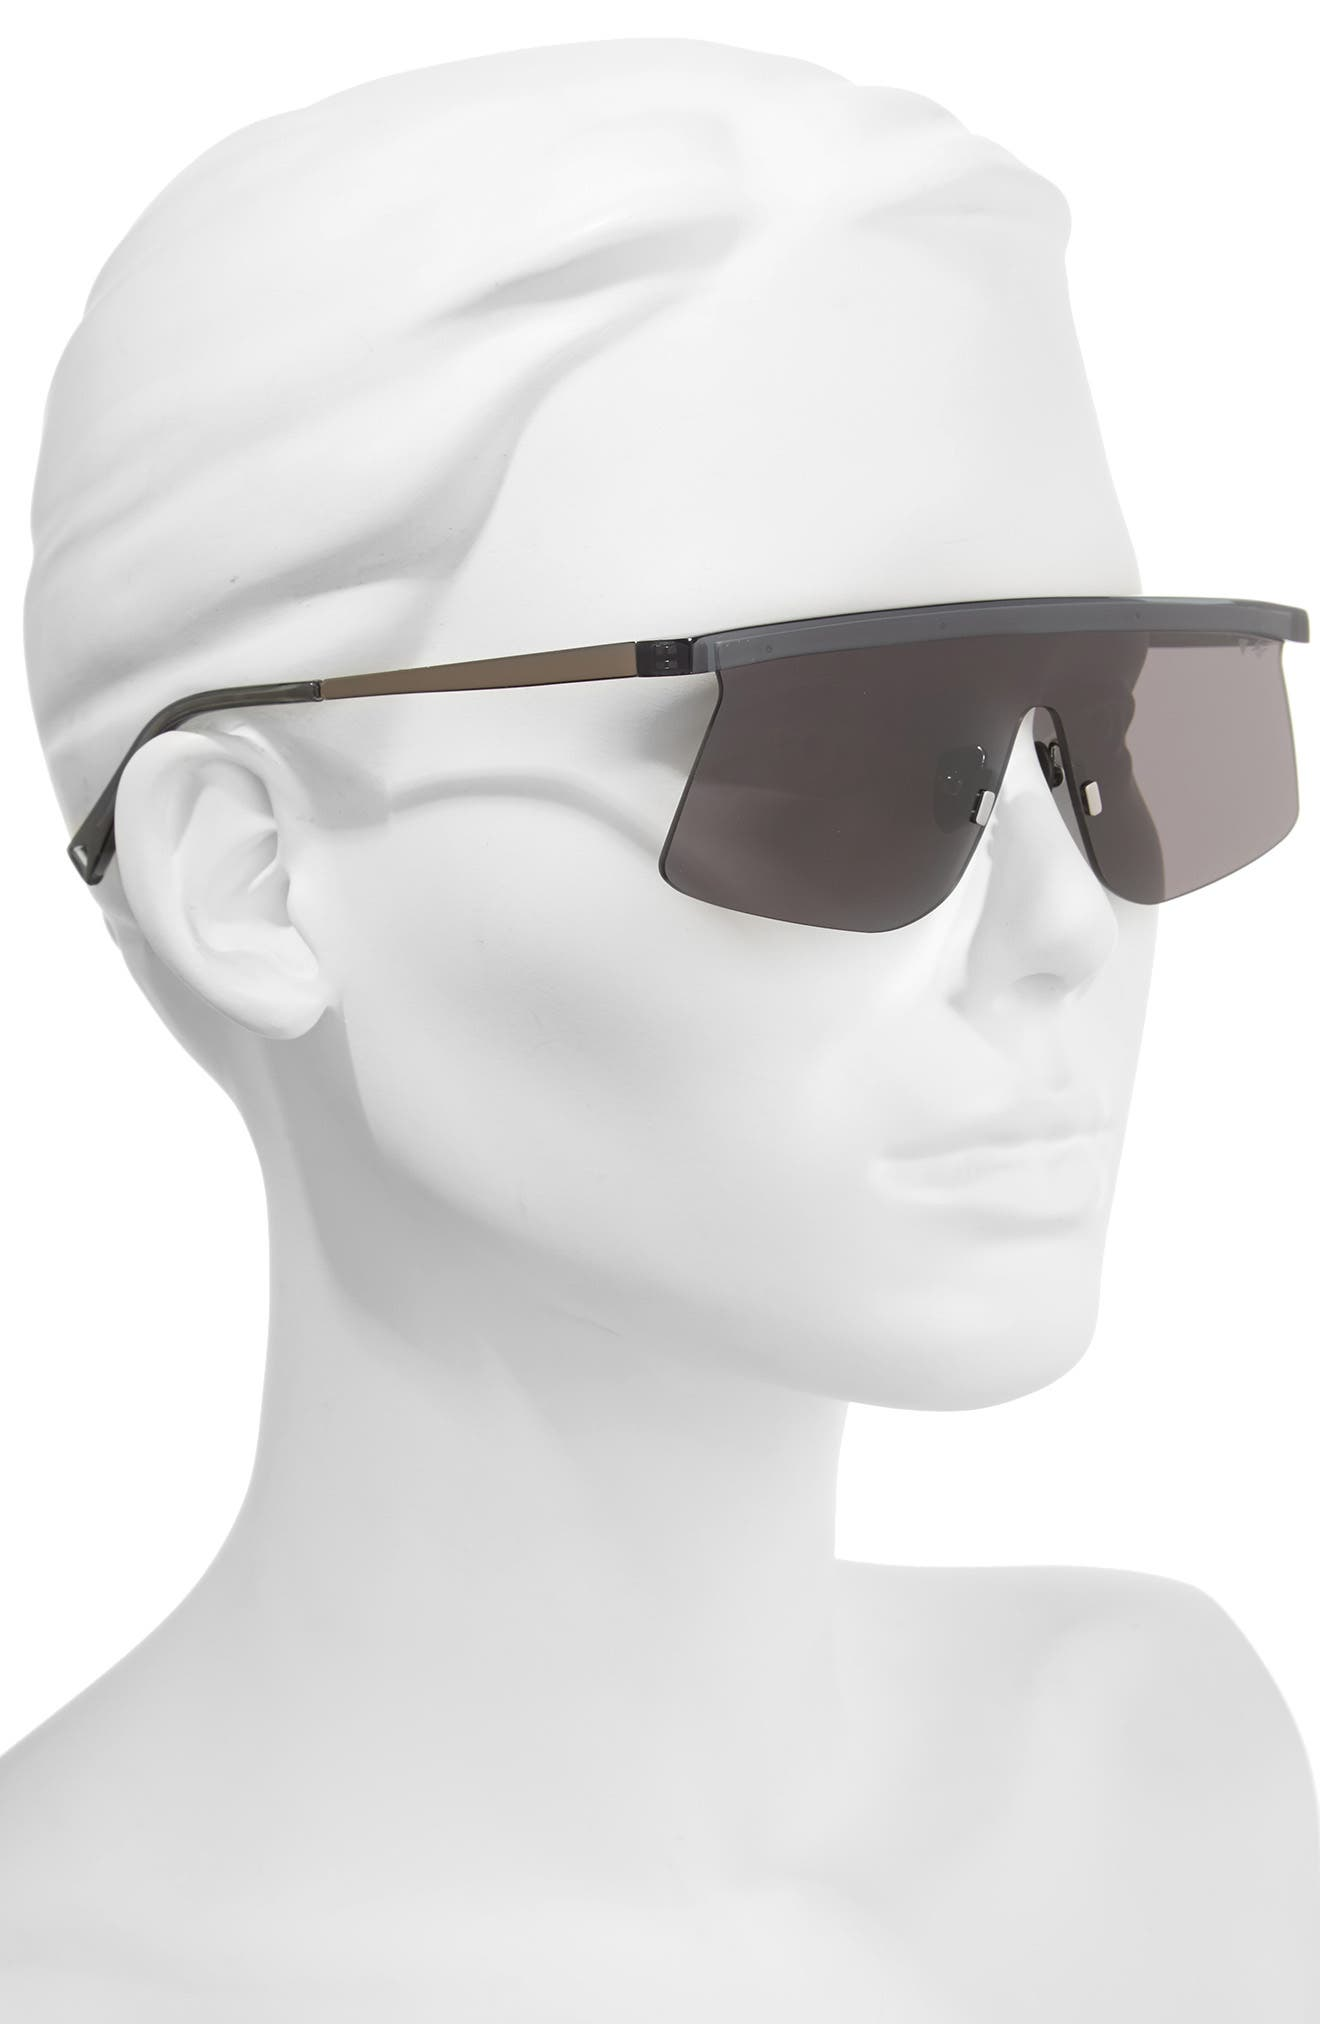 Shade Shield Sunglasses,                             Alternate thumbnail 2, color,                             020